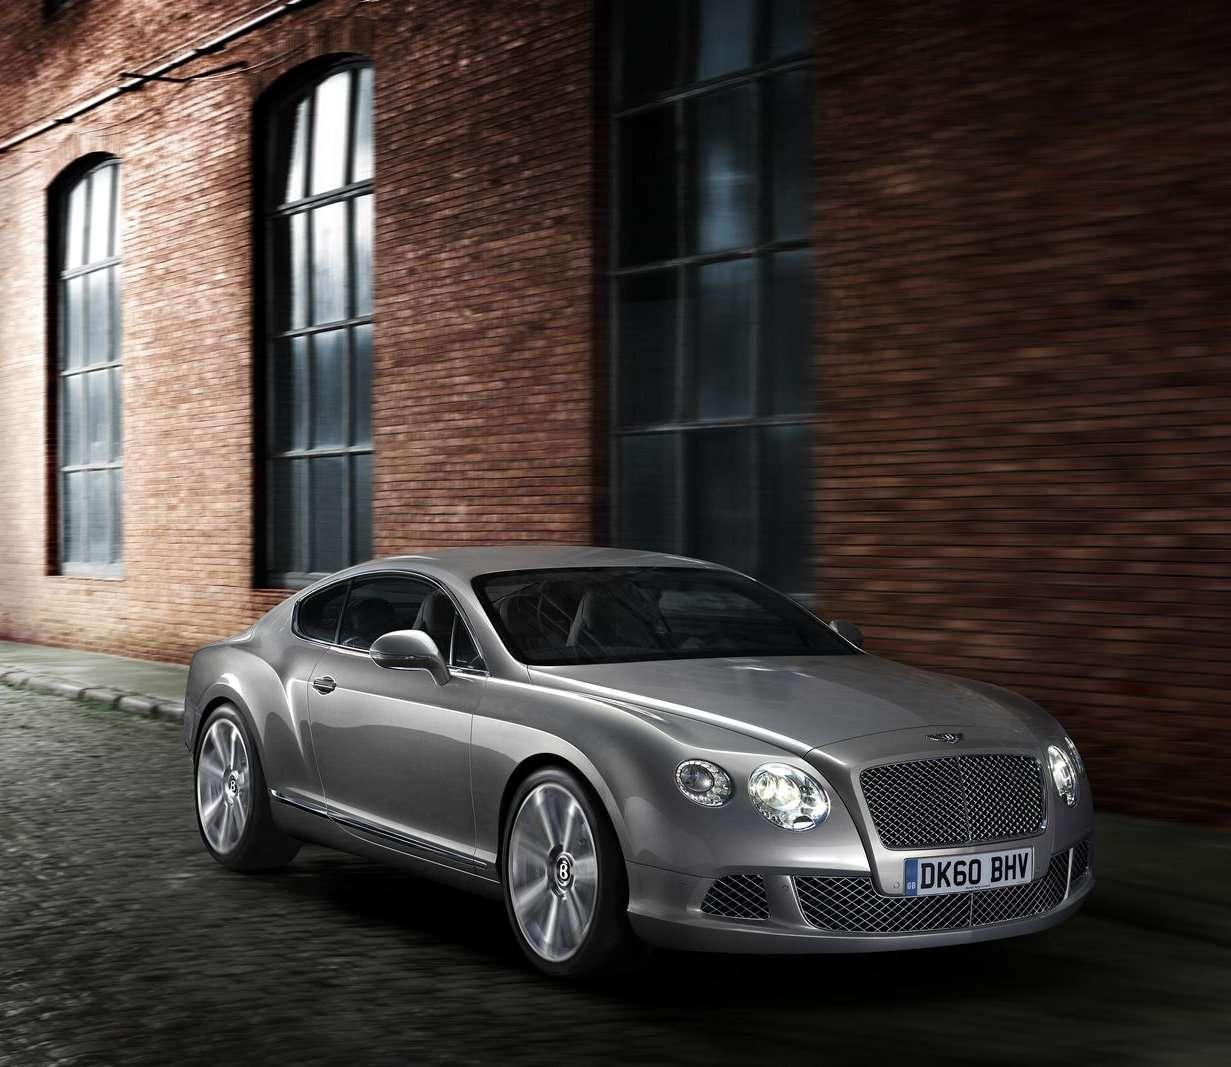 Bentley Continental Gtc Cabriolet 6 0 W12 2013 Supersport: Különleges Autók